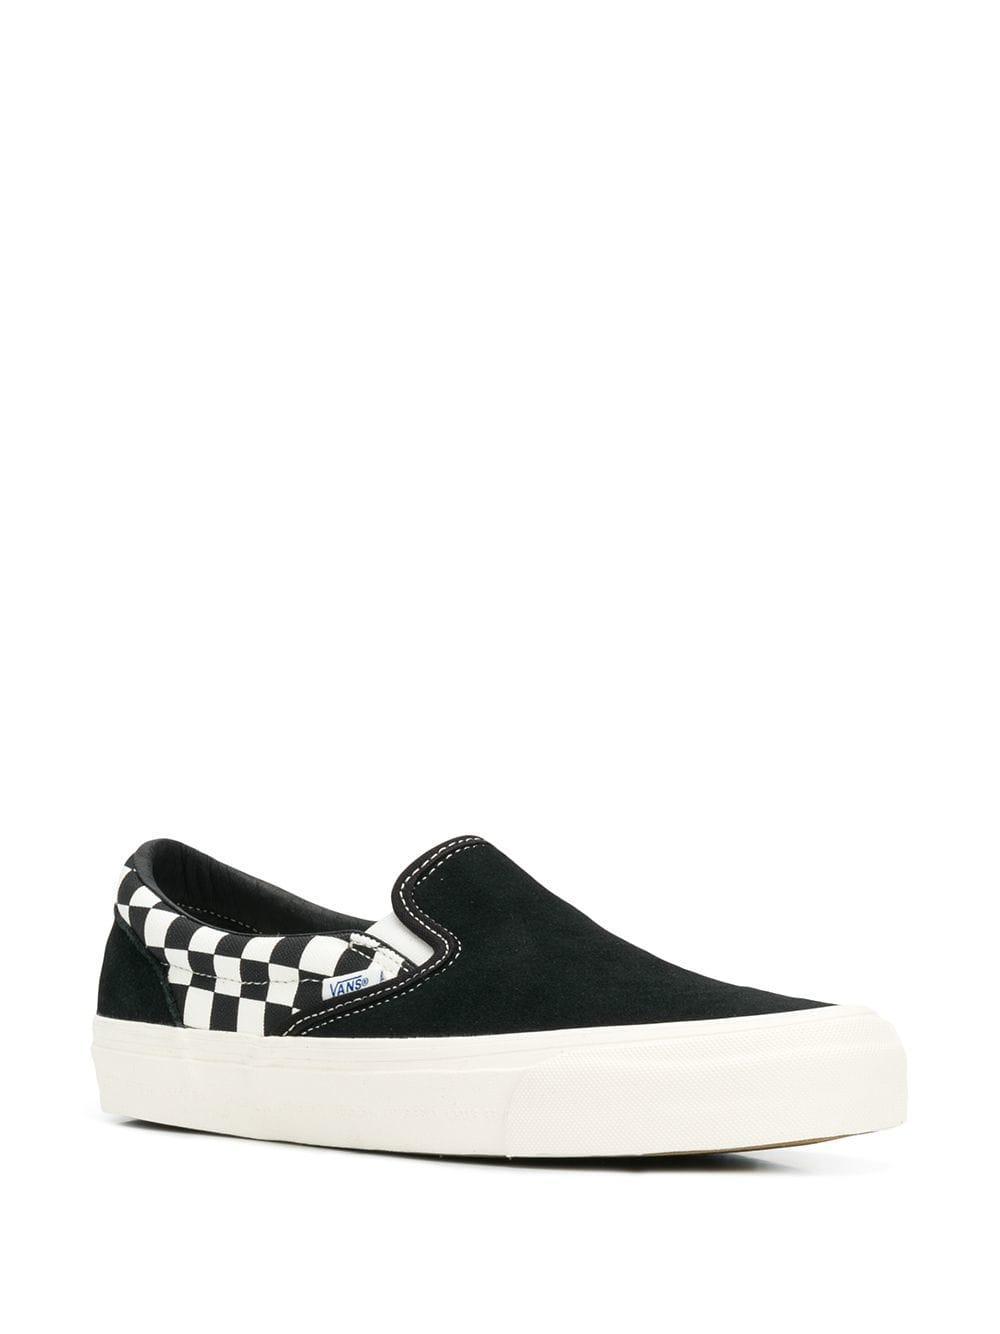 Black British Plaid Red Checkerboard print skateslipons sneakers Shoes